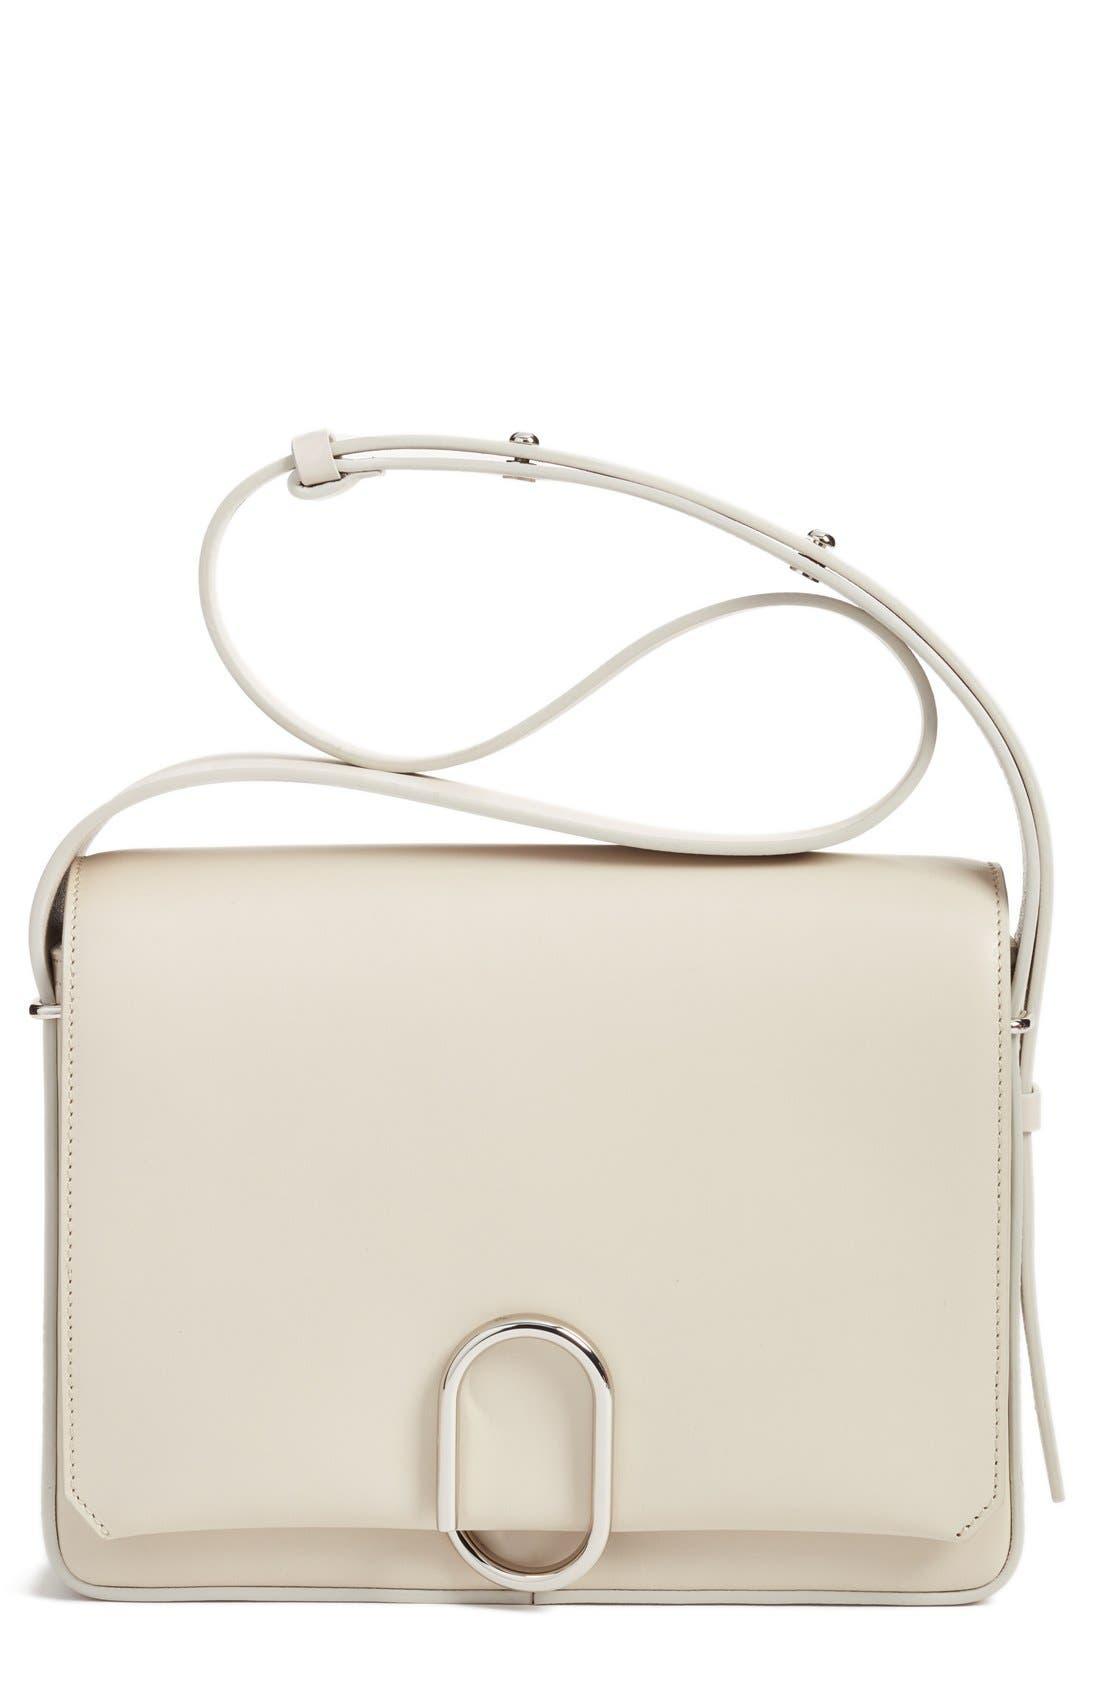 Main Image - 3.1 Philip Lim 'Alix' Flap Leather Shoulder Bag